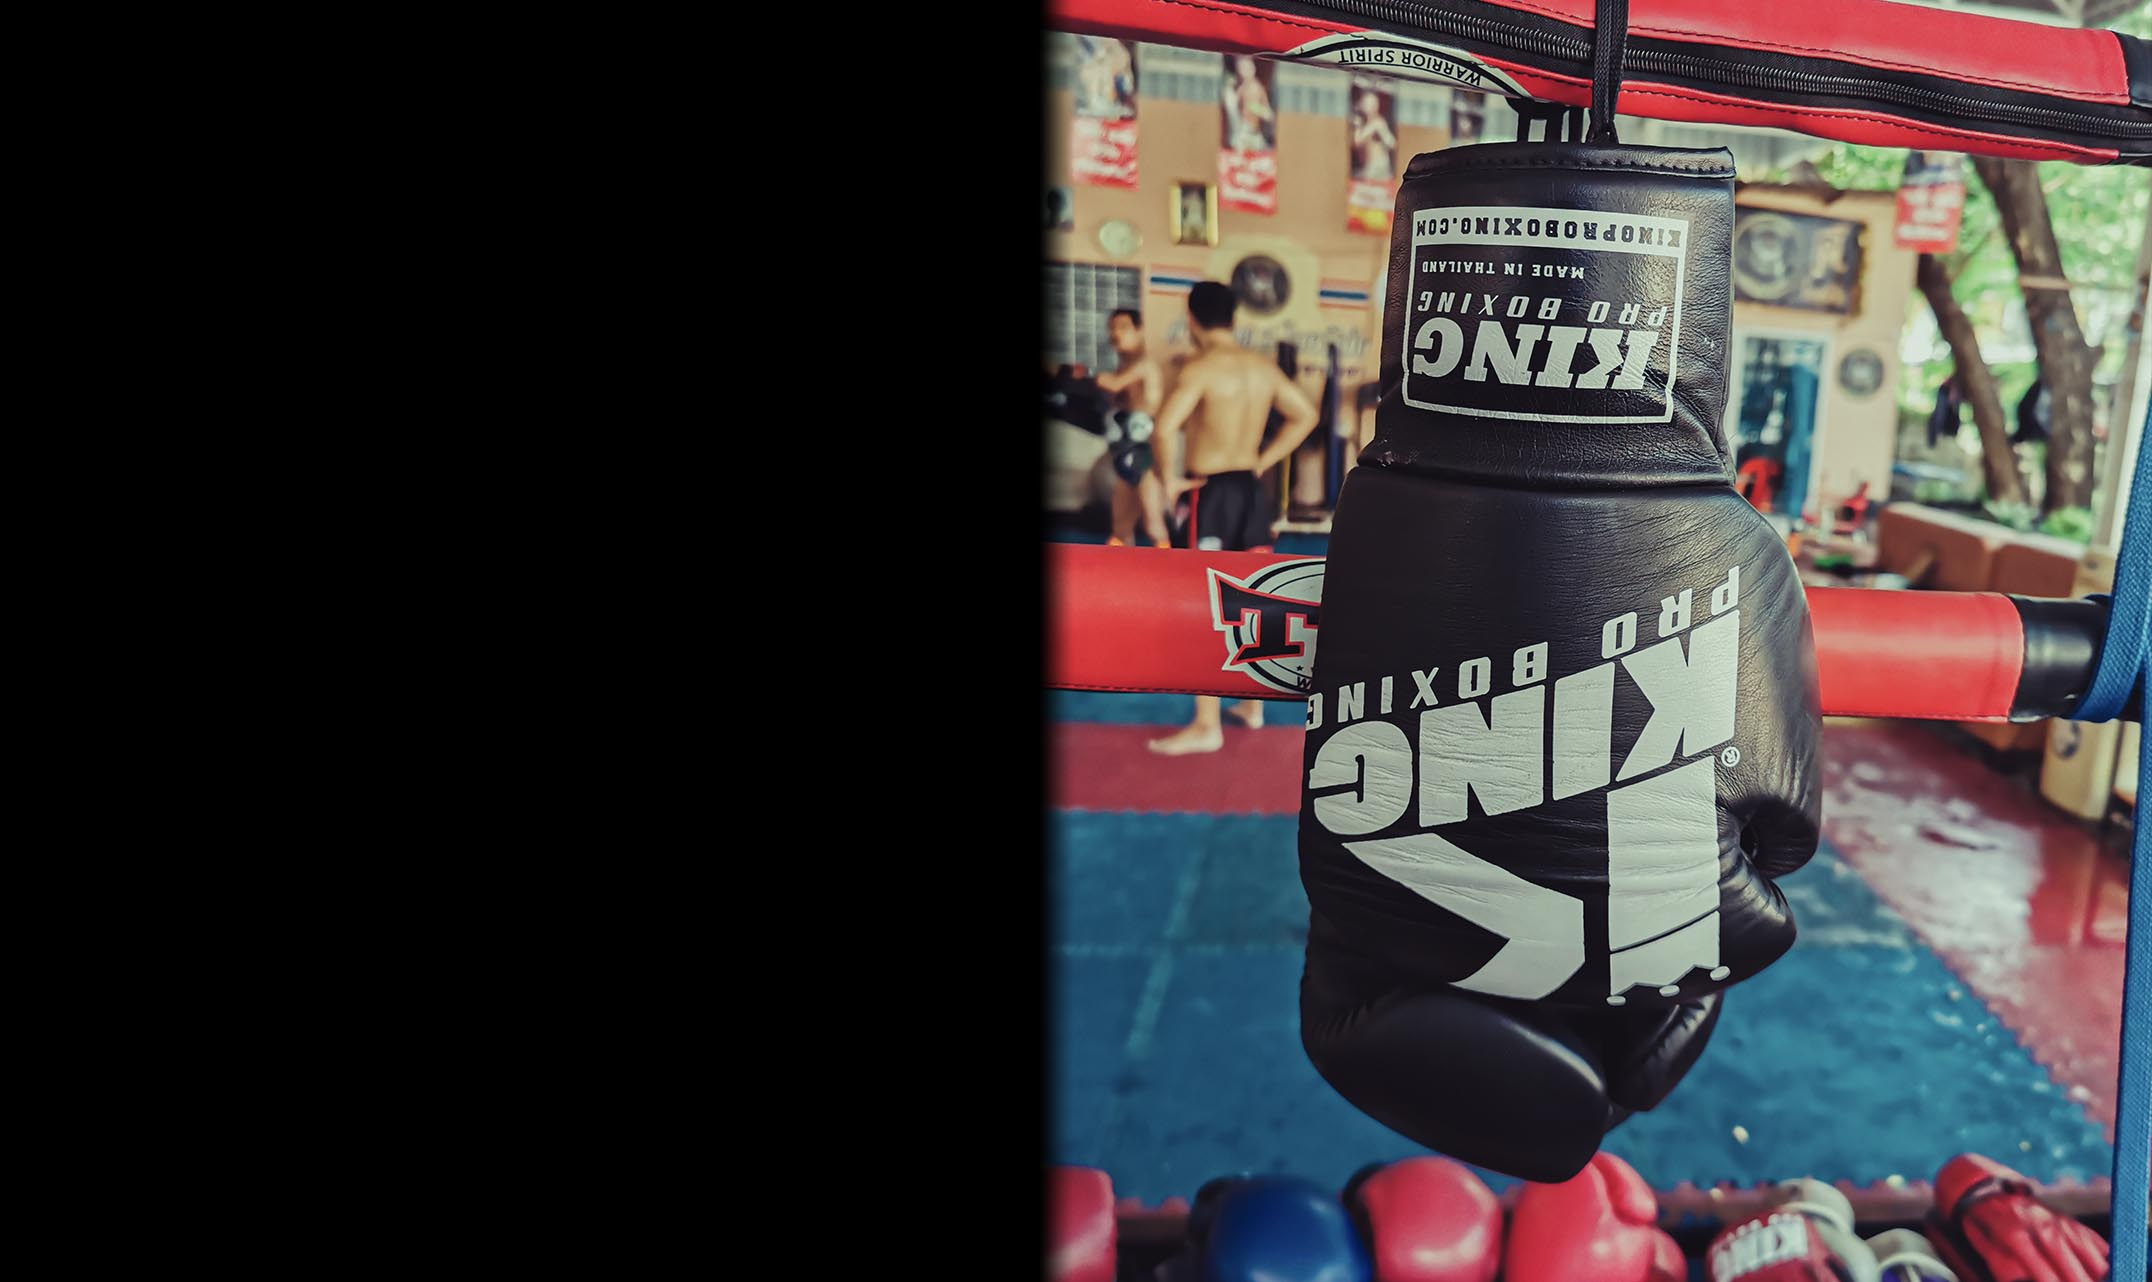 'Old school vs modern Muay Thai gyms'